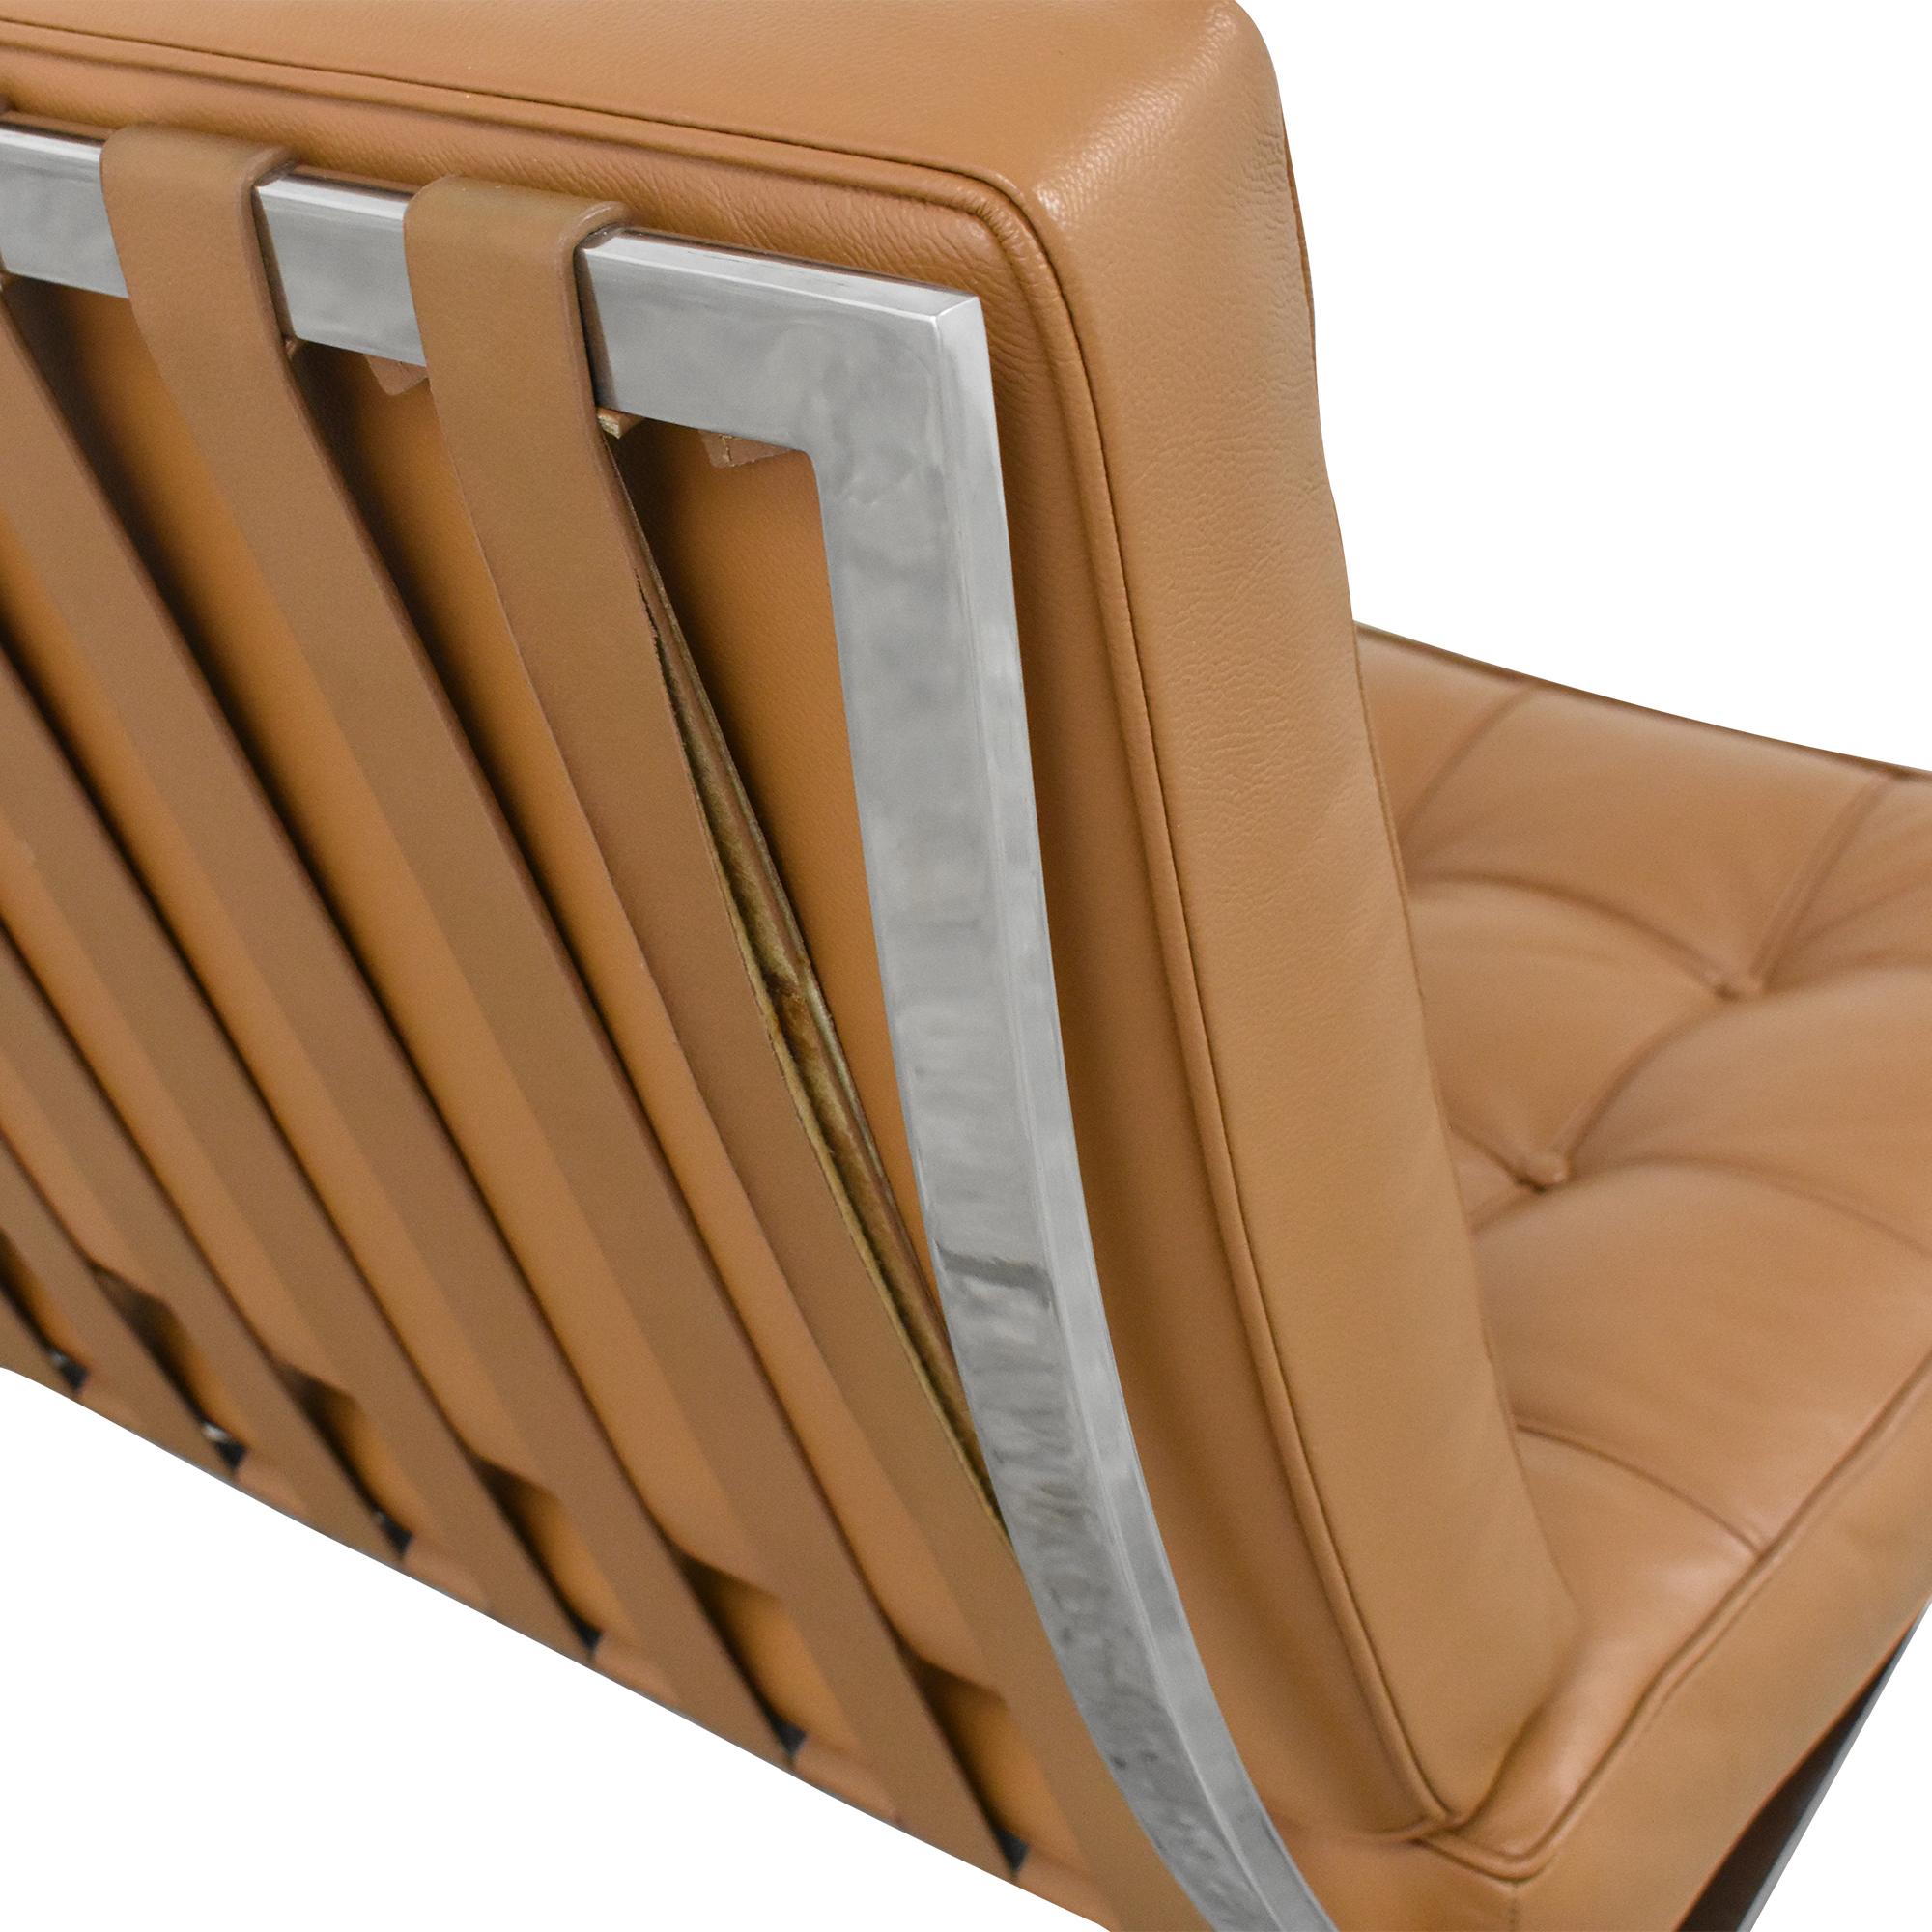 Modern Classics Modern Classics Barcelona Chair Replica on sale